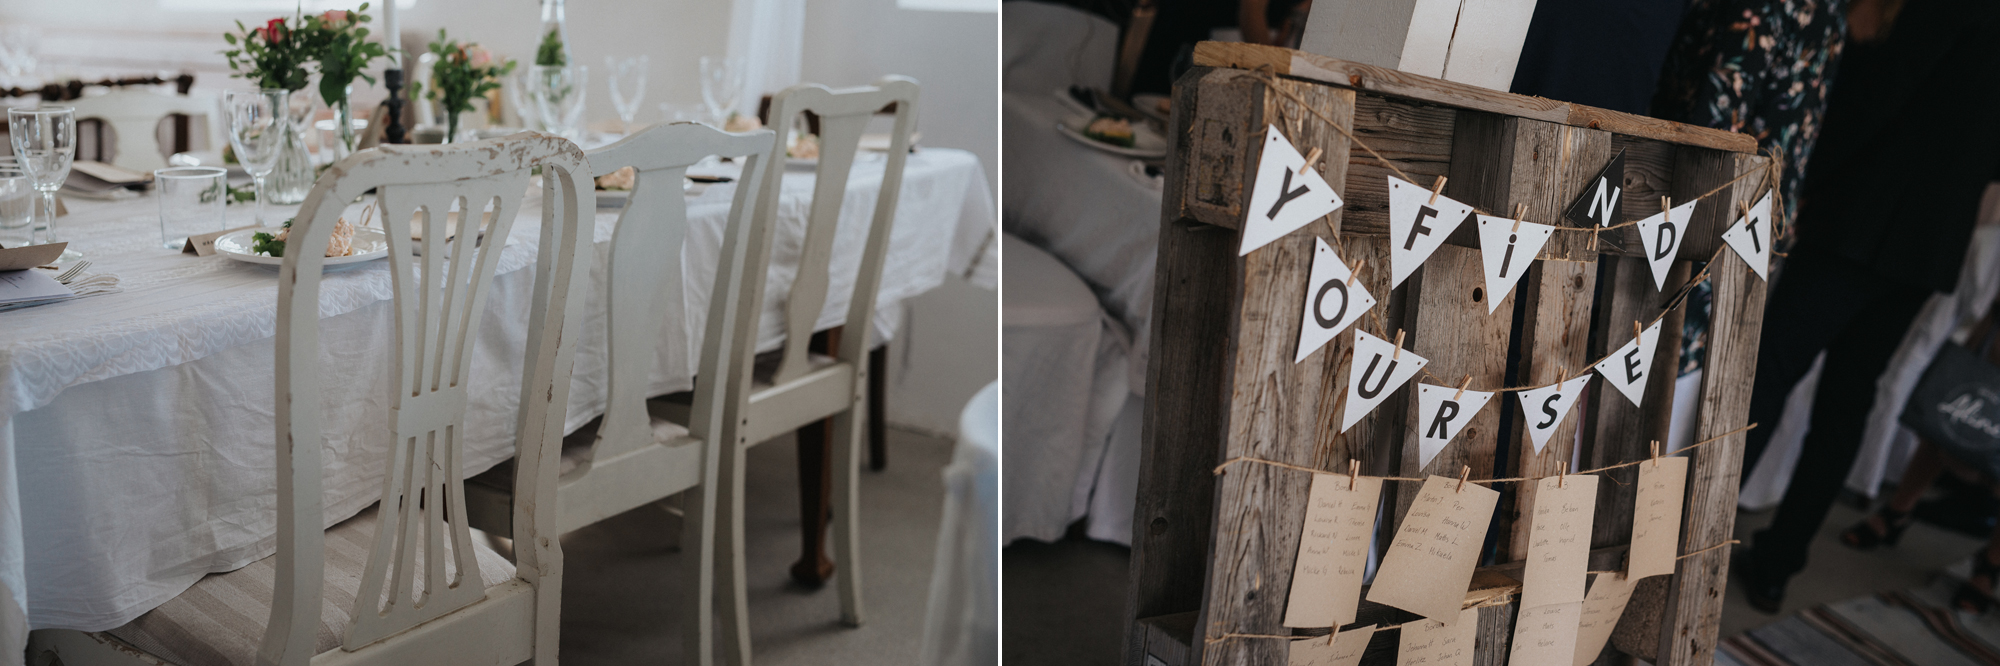 026-bröllop-hemma-hos-ulrika-gotland-neas-fotografi.jpg